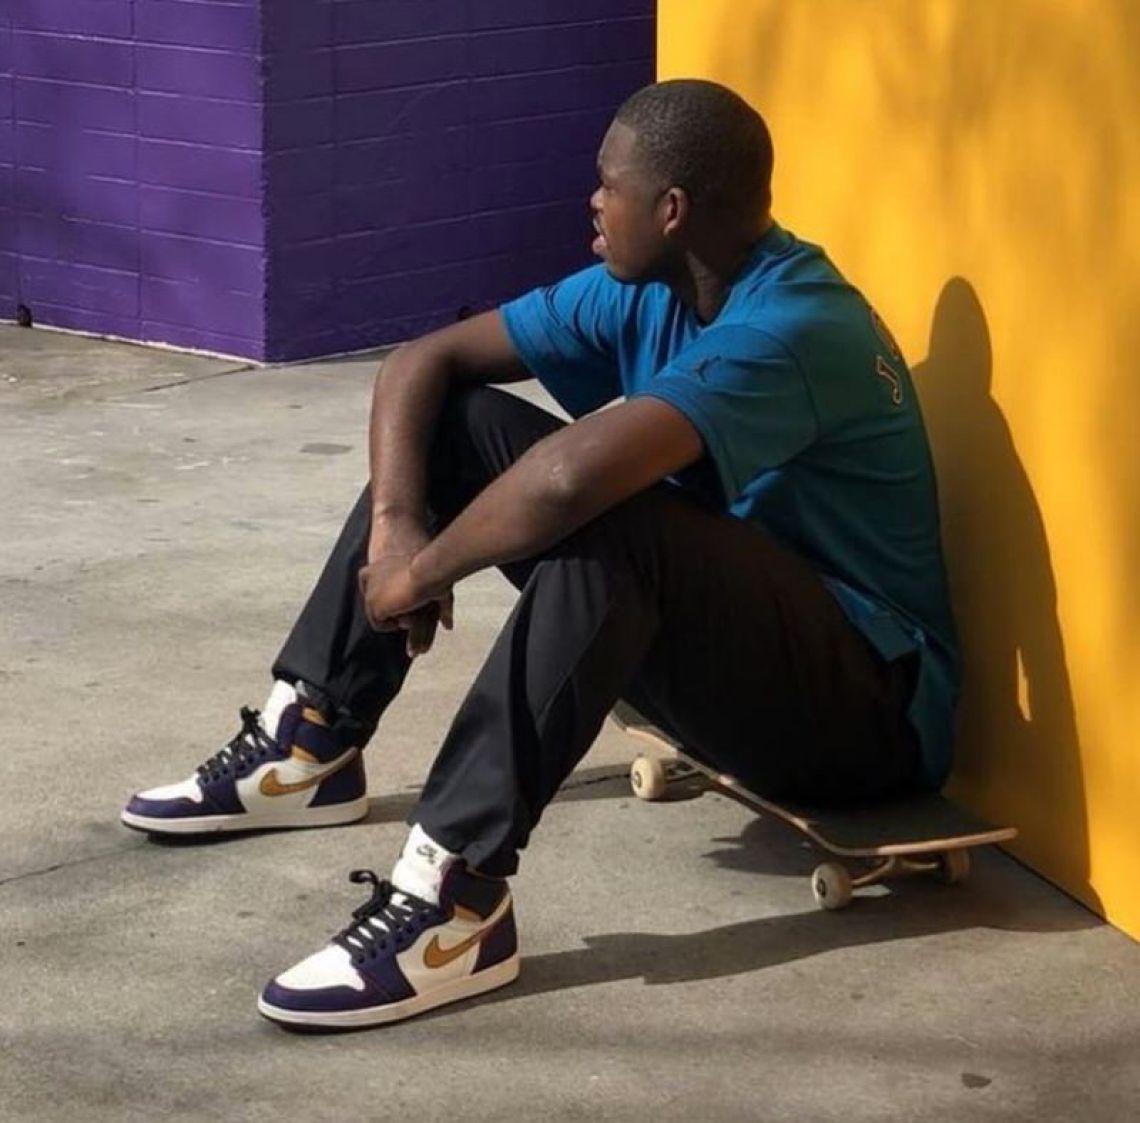 Theotis Beasley in the Air Jordan 1 x Nike SB